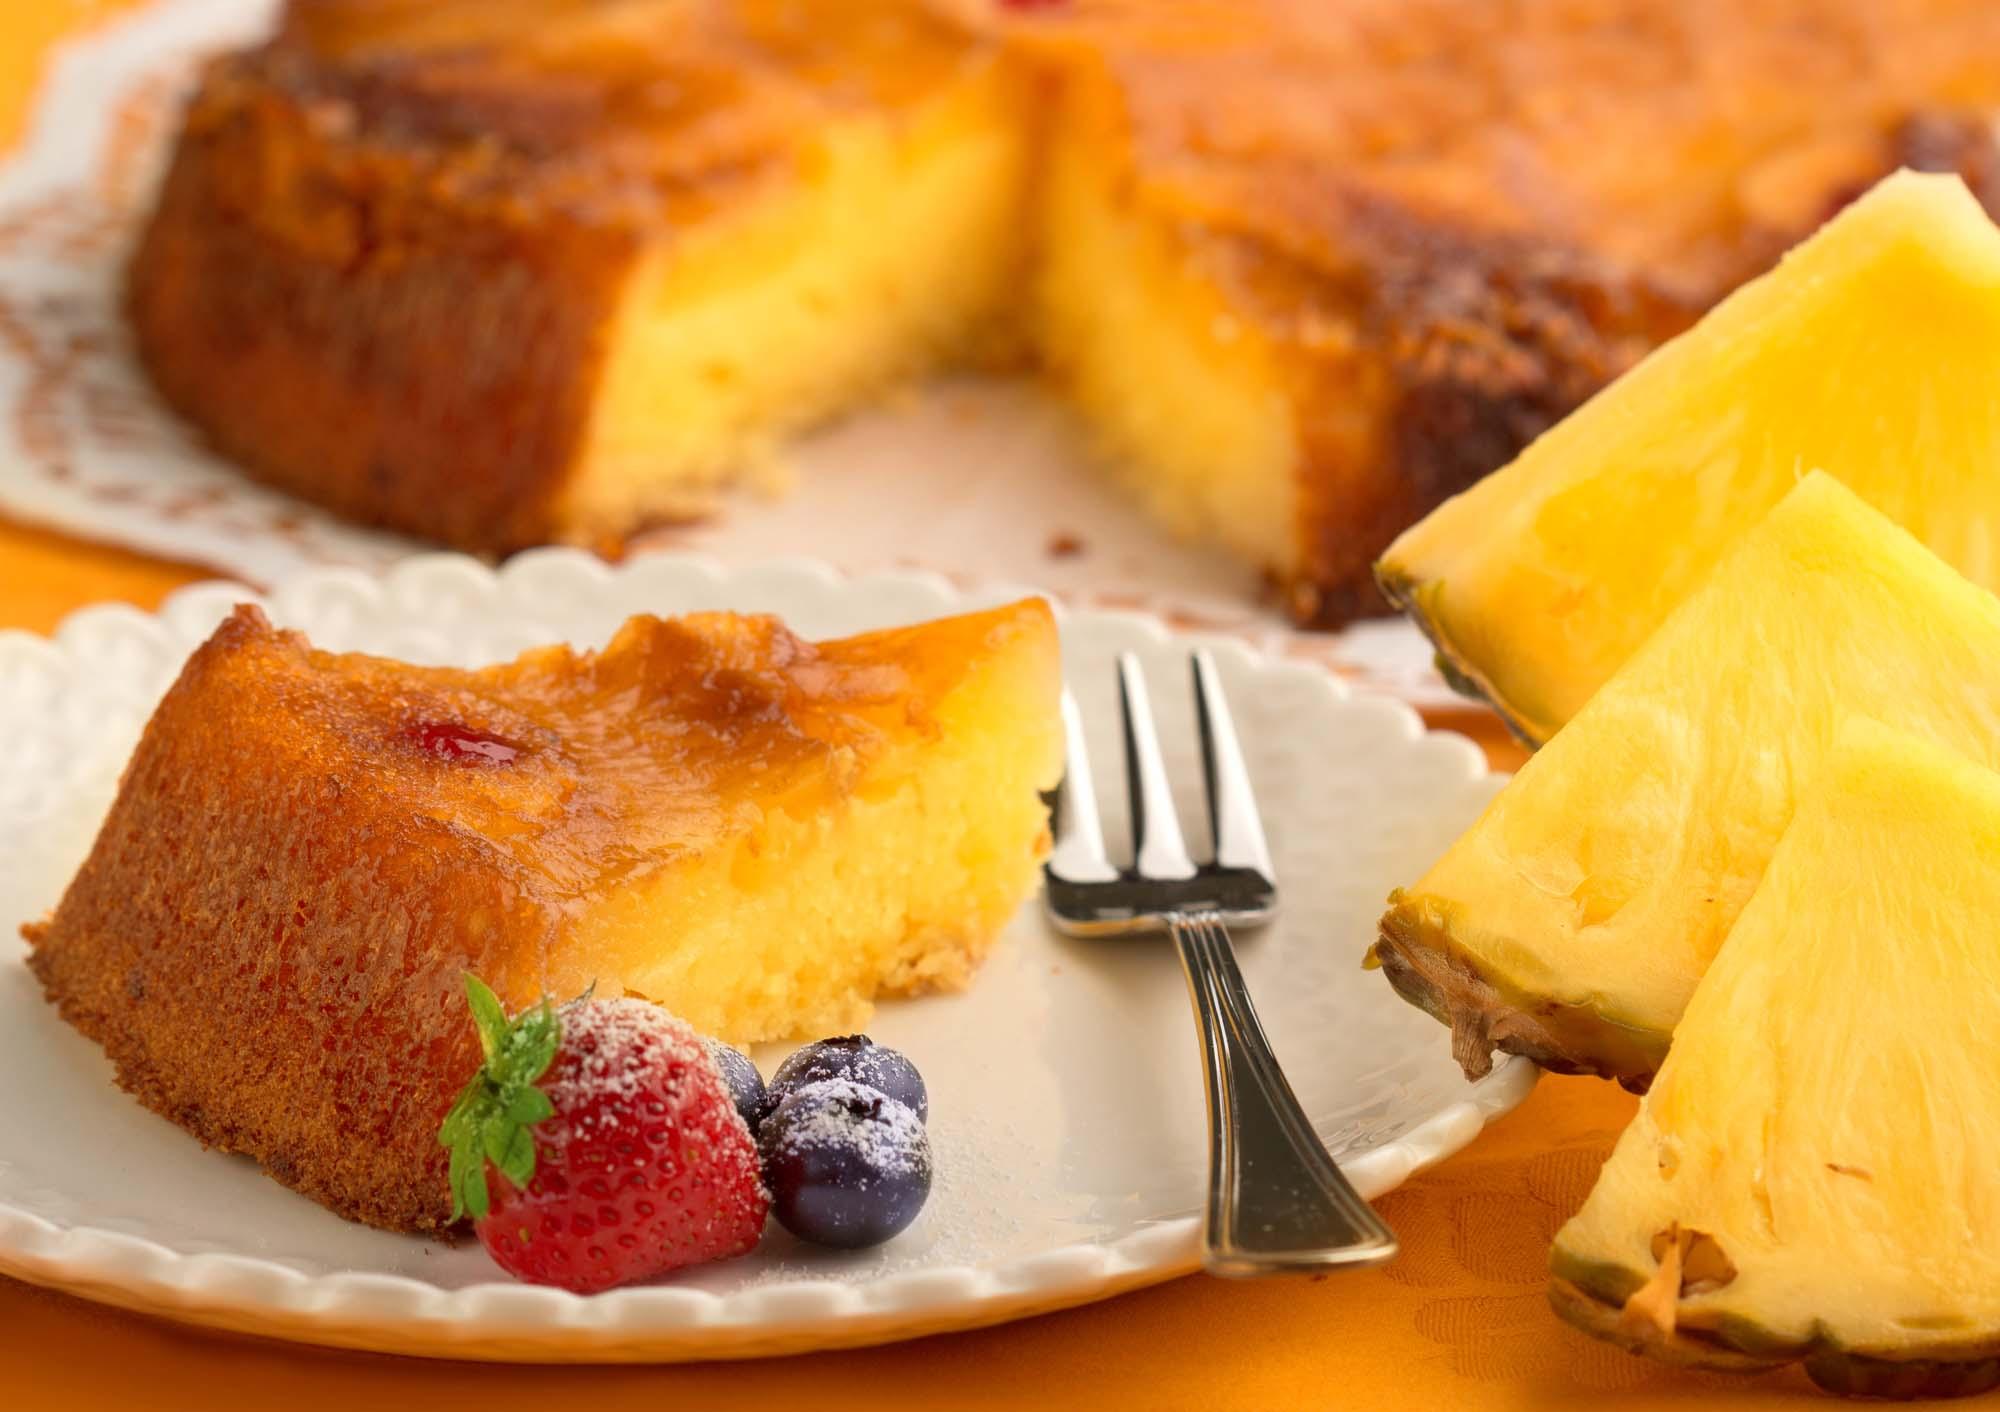 Ananaskage